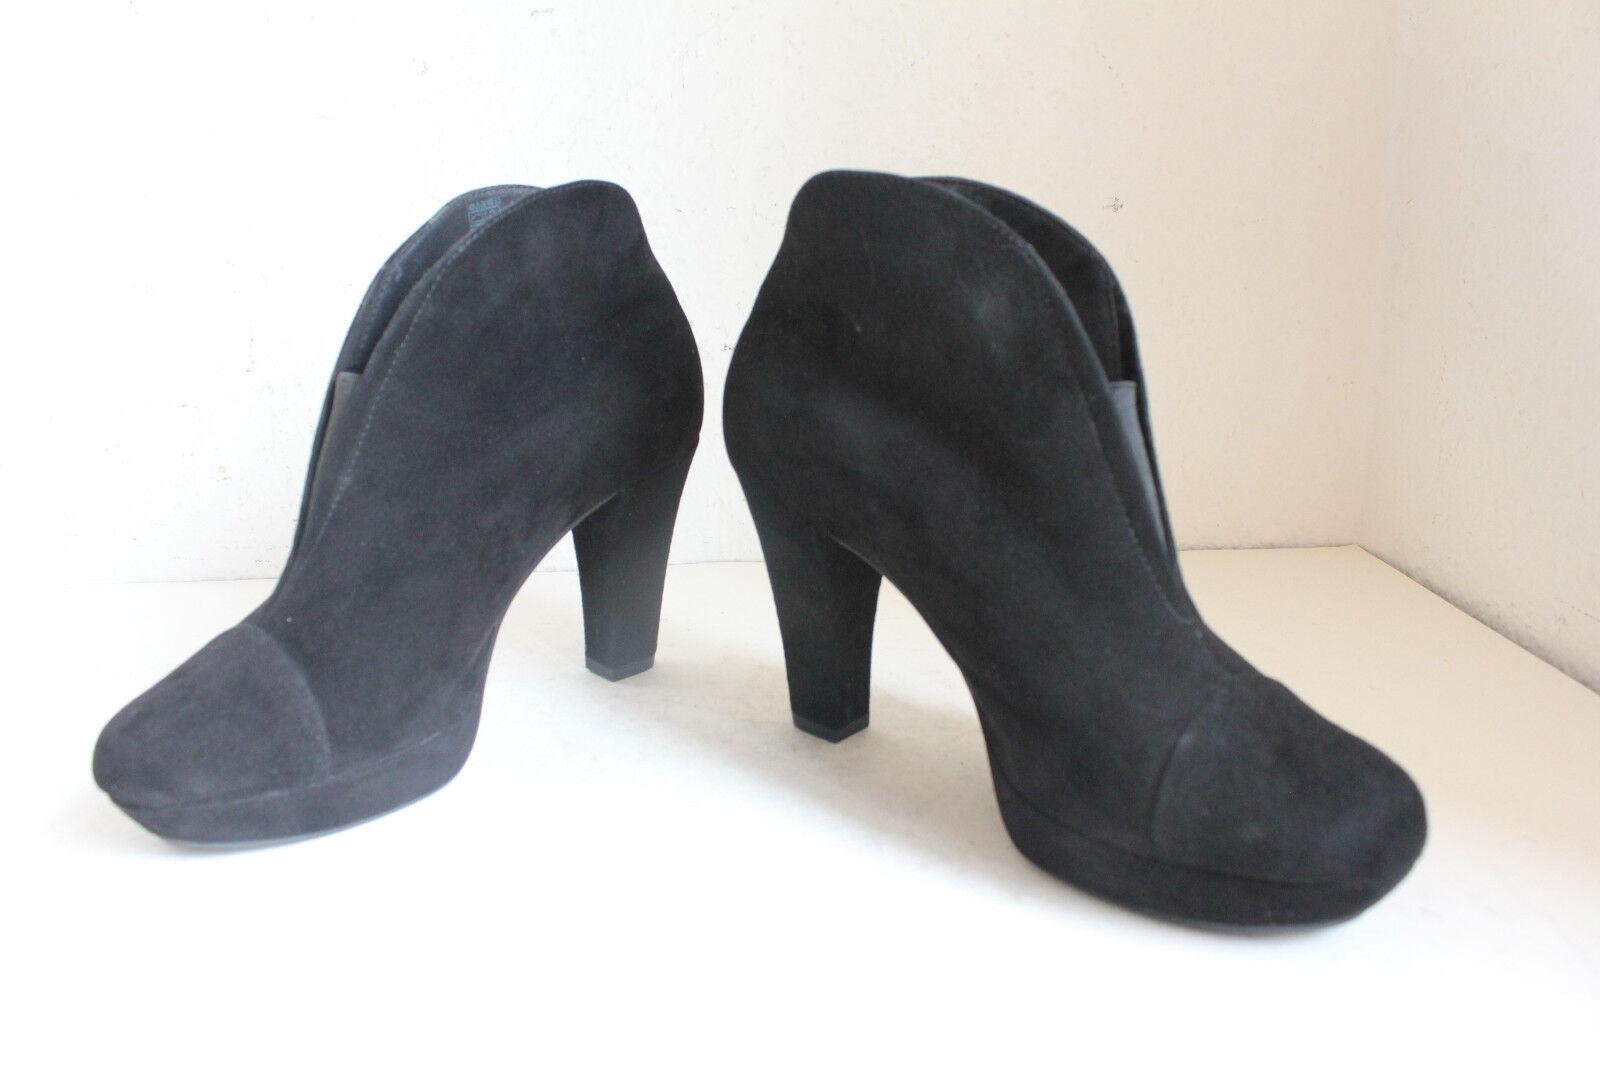 Marc Elegante Trendy Stiefeletten Boots Nubukleder Schwarz Eu:38,5-Uk:5,5